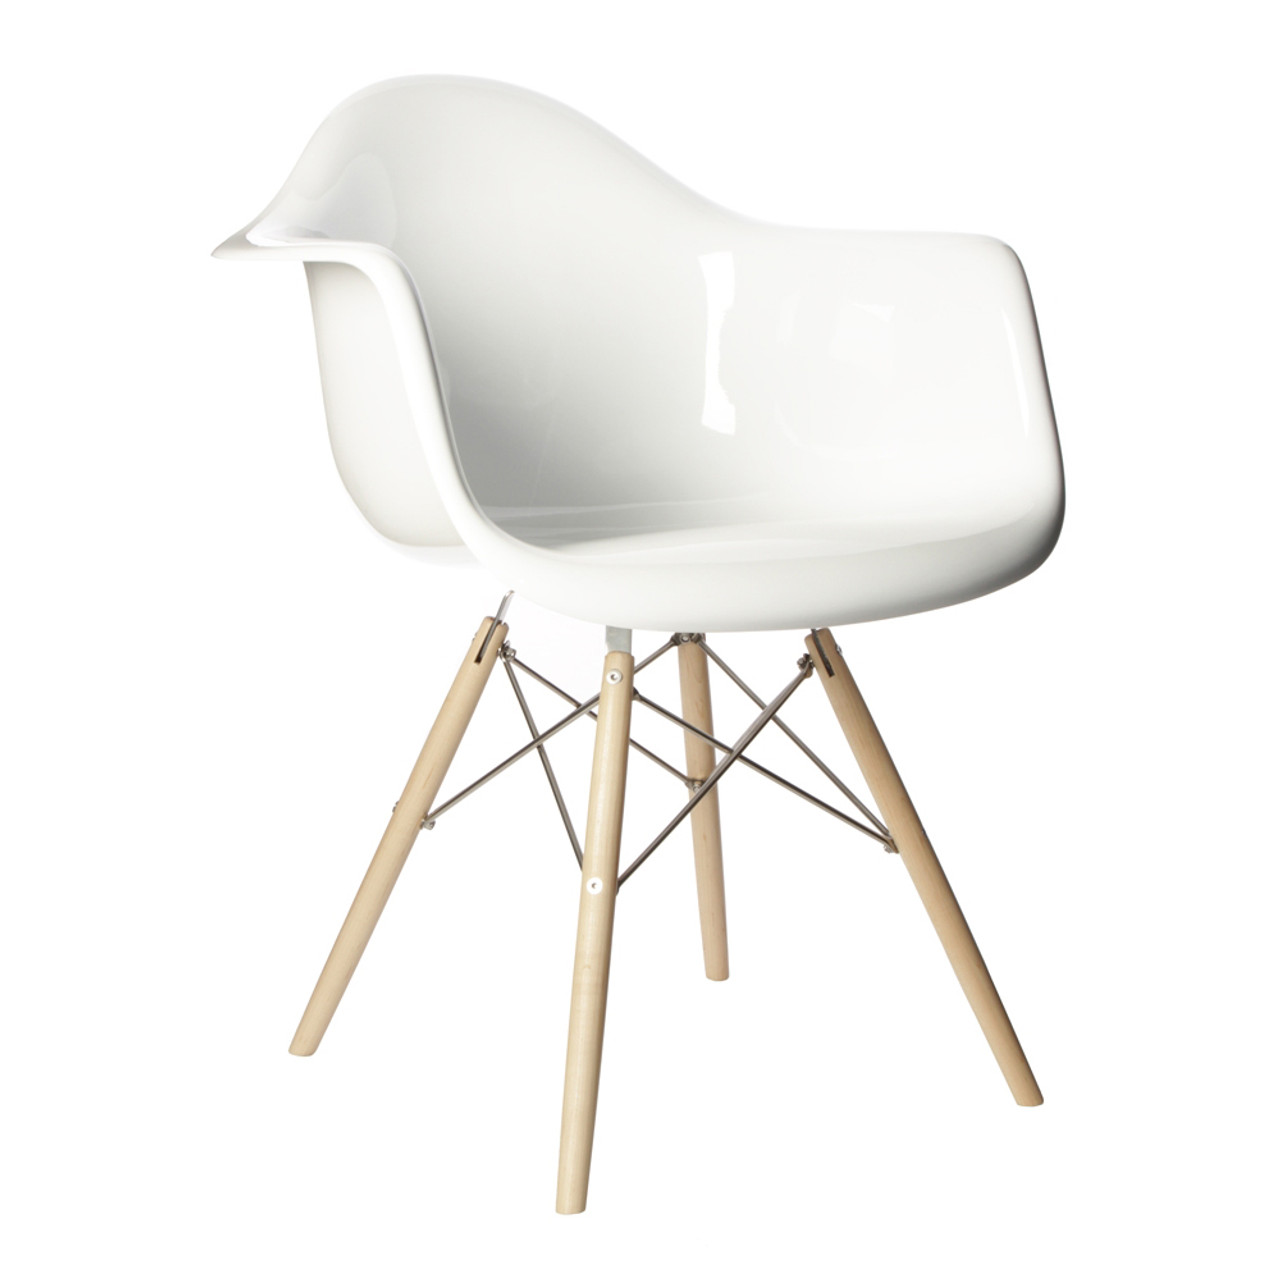 Charles Eames Style DAW Arm Chair, White ABS Plastic